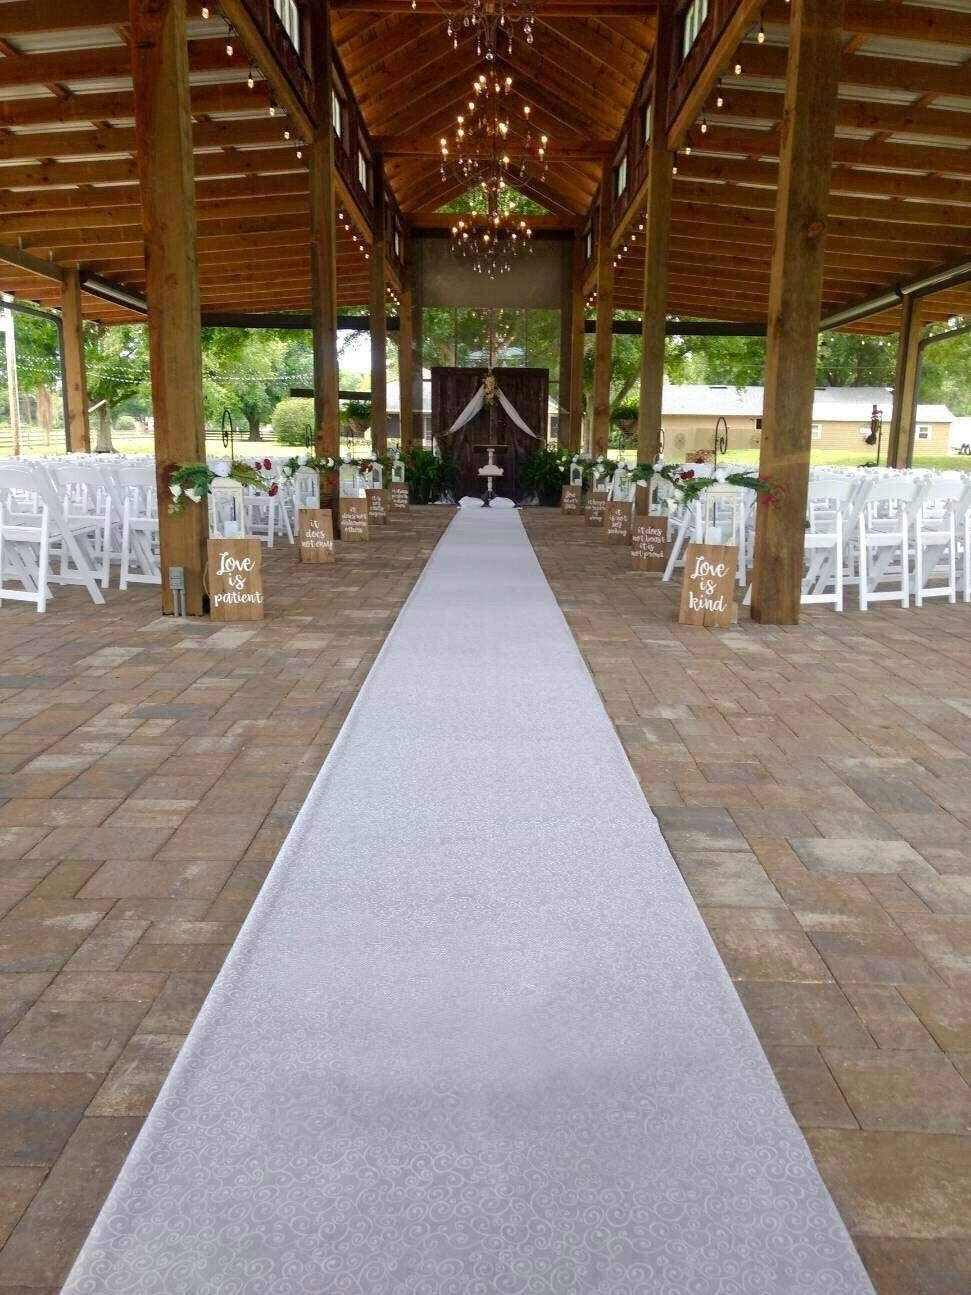 24inx33ft Wedding Aisle Runner Wedding Rugs Essential Indoor and Outdoor Wedding Decoration Dream Wedding Decor